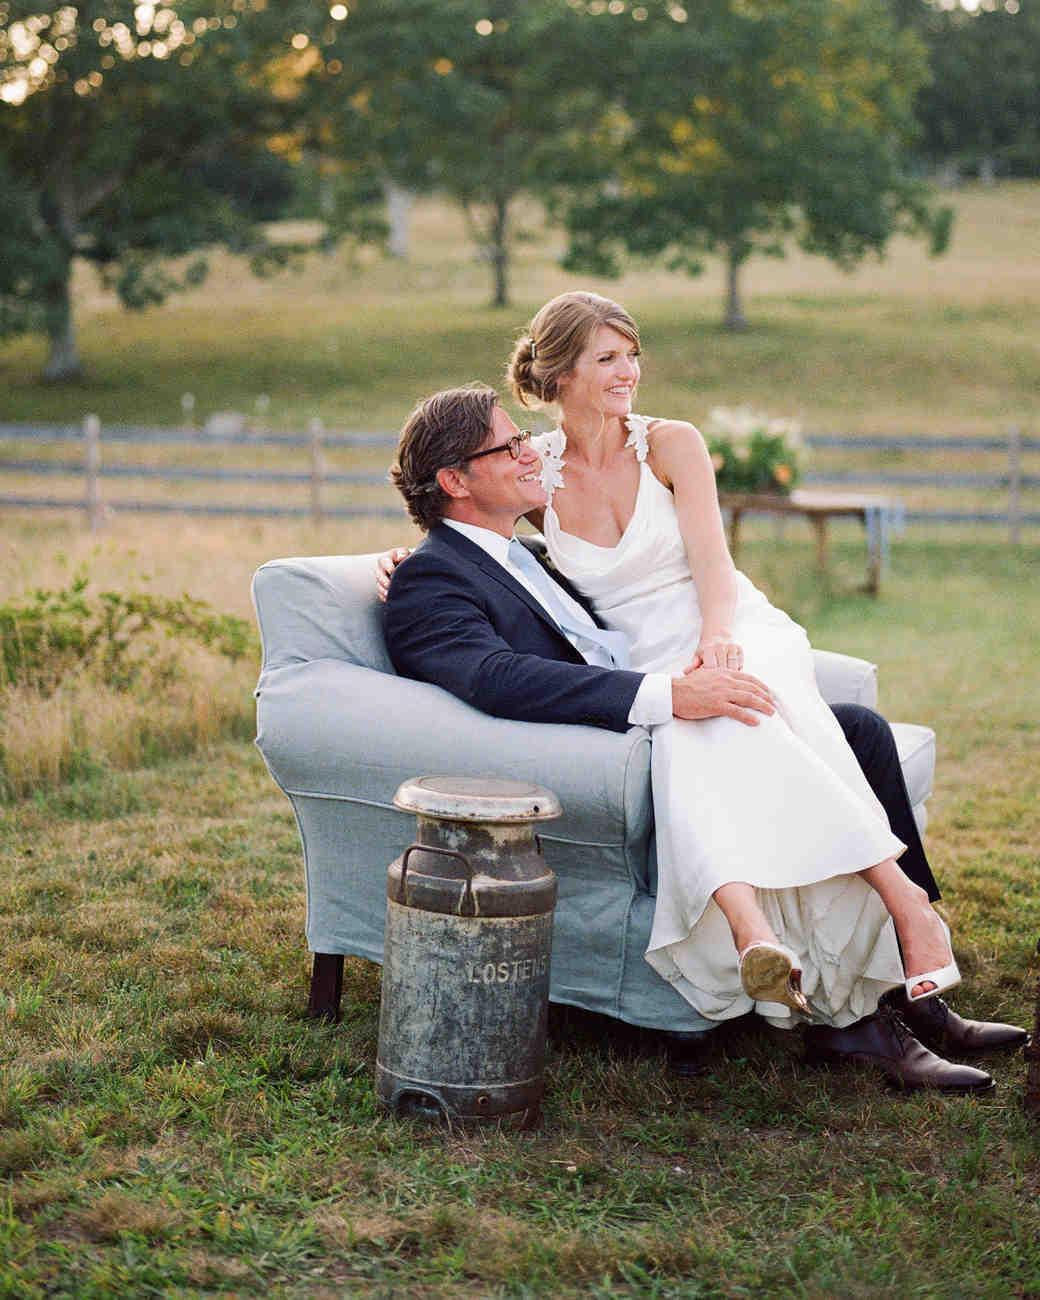 Olivia And Tyler S Black Tie Wedding In Their Family S: Jocelyn And Graham's Elegant Martha's Vineyard Wedding